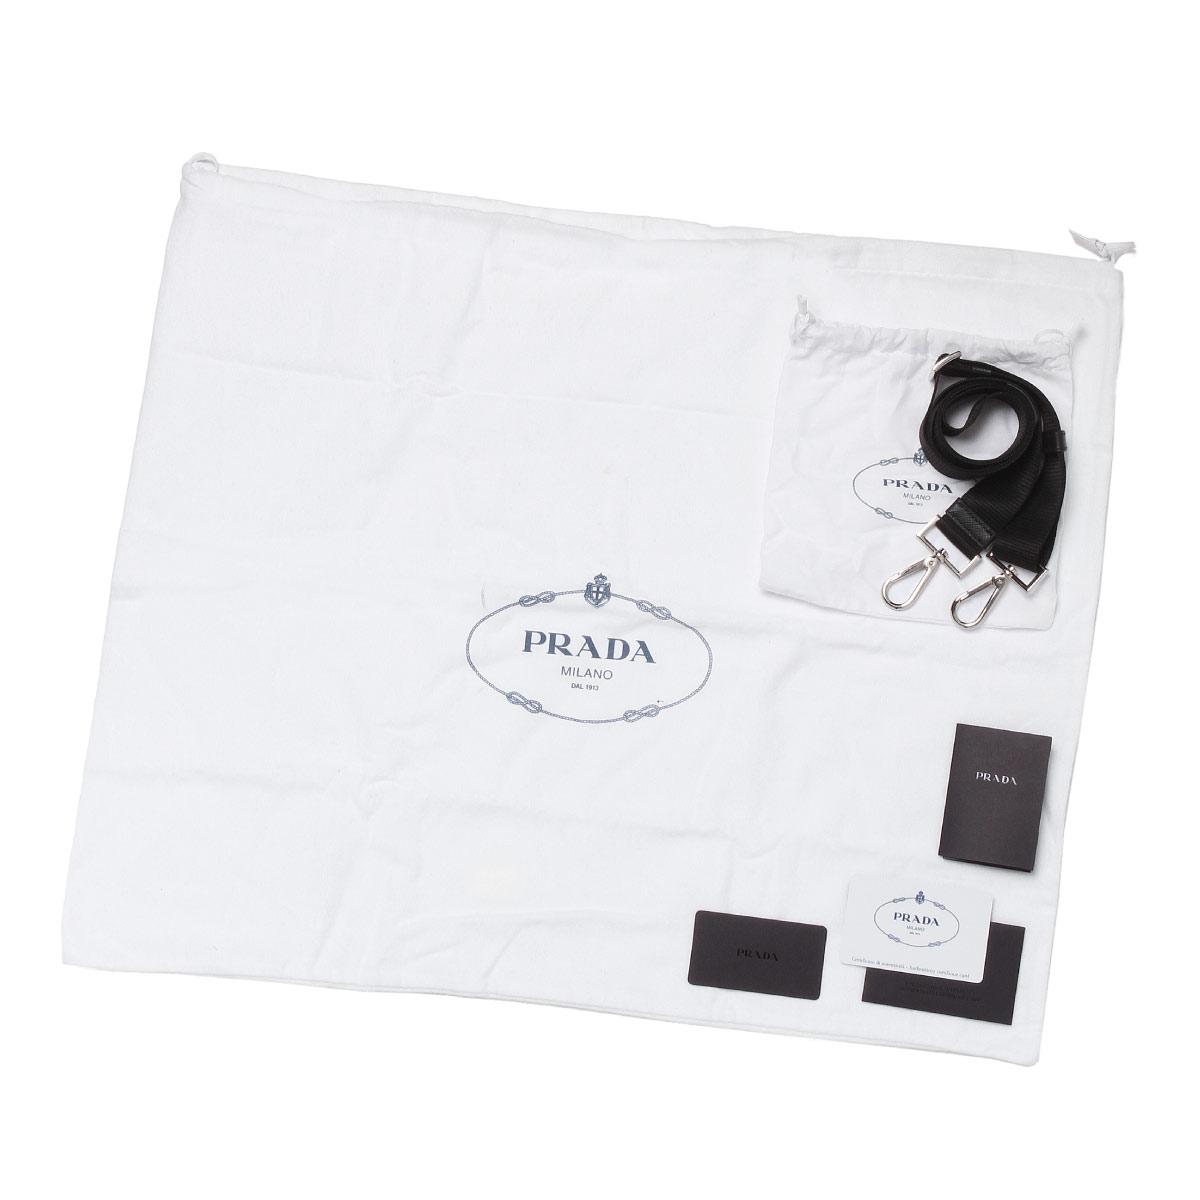 c8a90aba7f2e8a ... Prada PRADA bag lady 1BG696 V44 F0161 shoulder tote bag MILITARE Green  belonging to ...